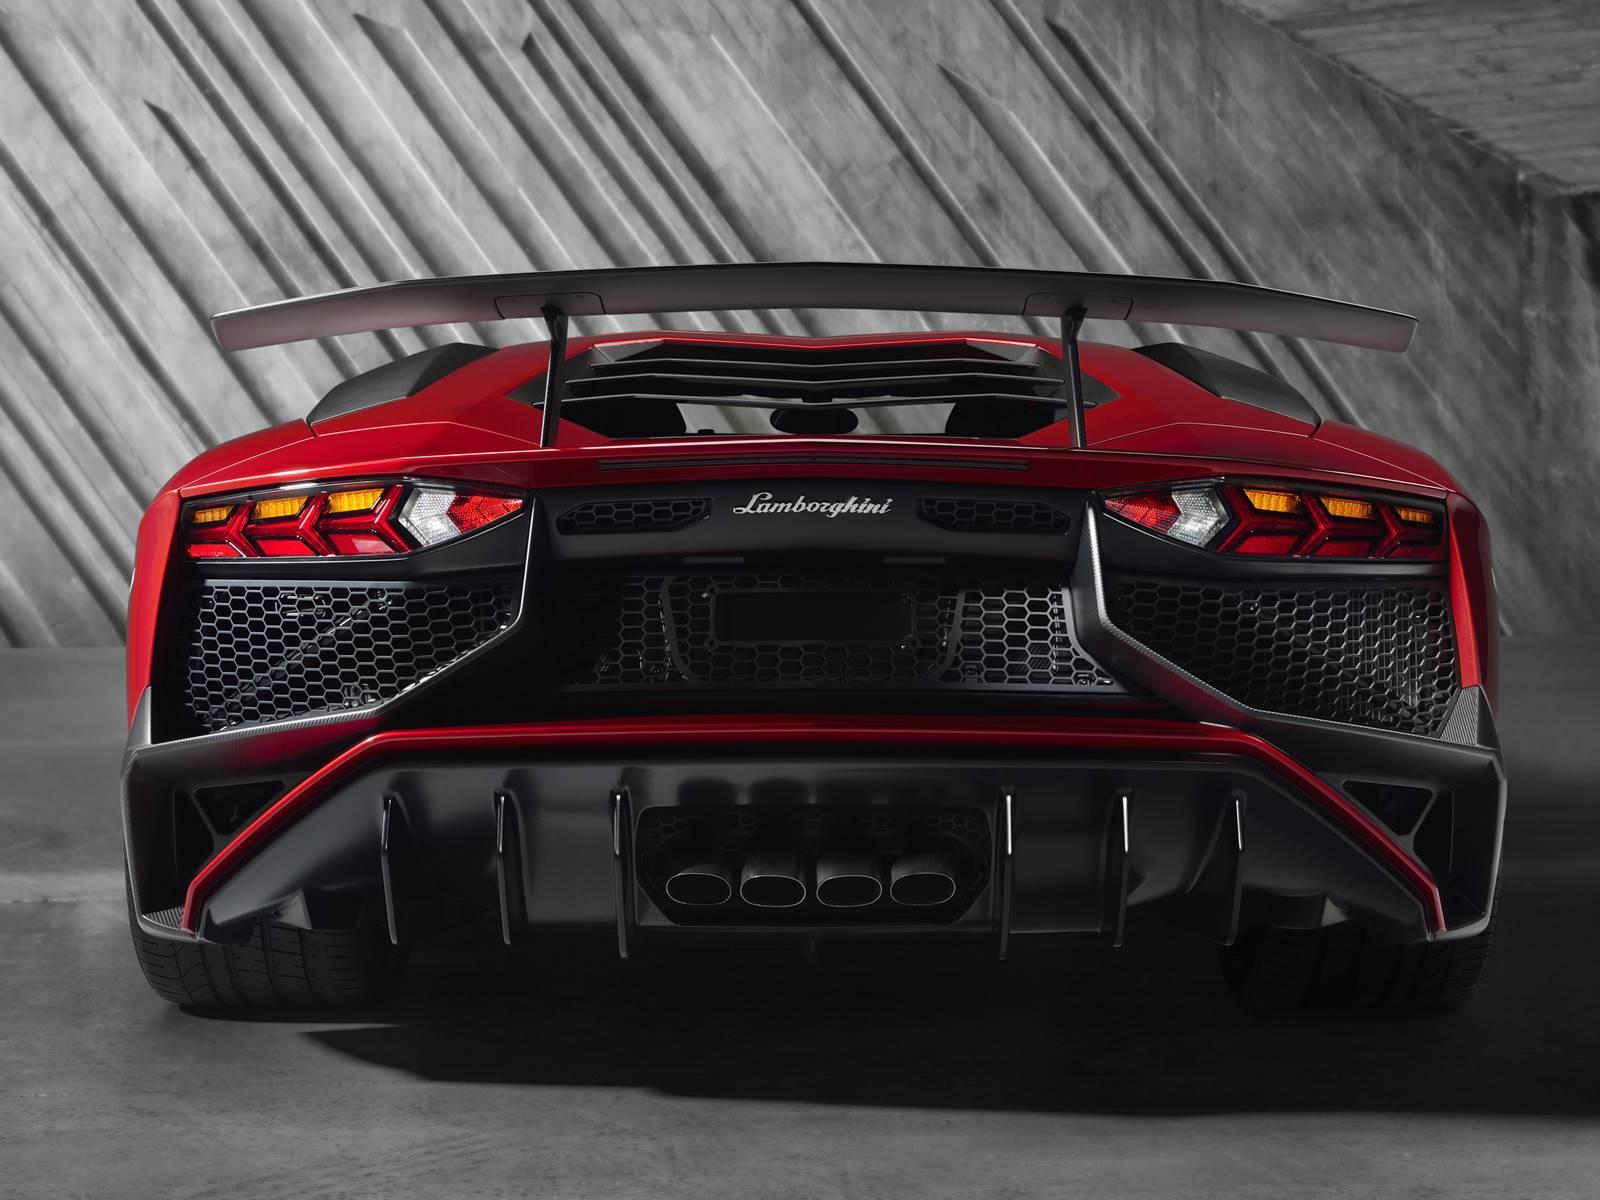 Lamborghini LP750-4 Superveloce